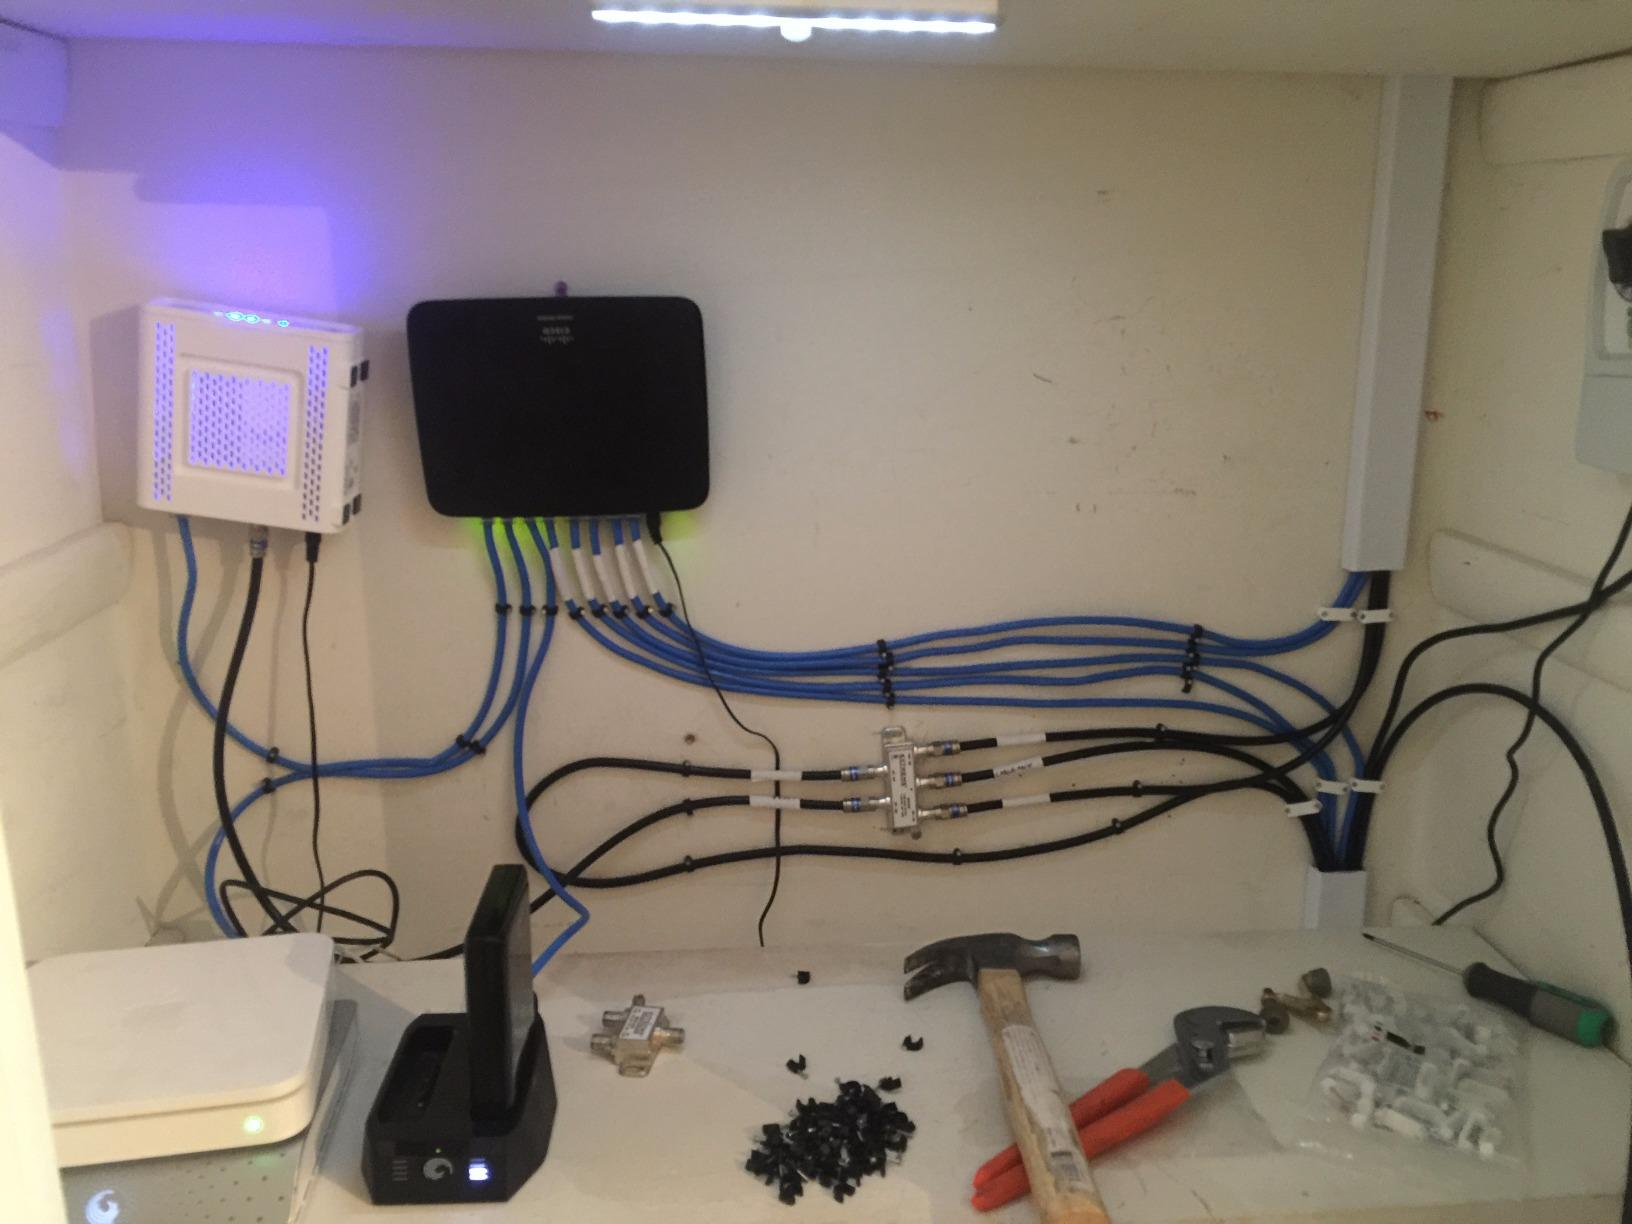 Linksys SE1500 5-Port Fast Ethernet Switch - Amazon Mỹ | Fado vn